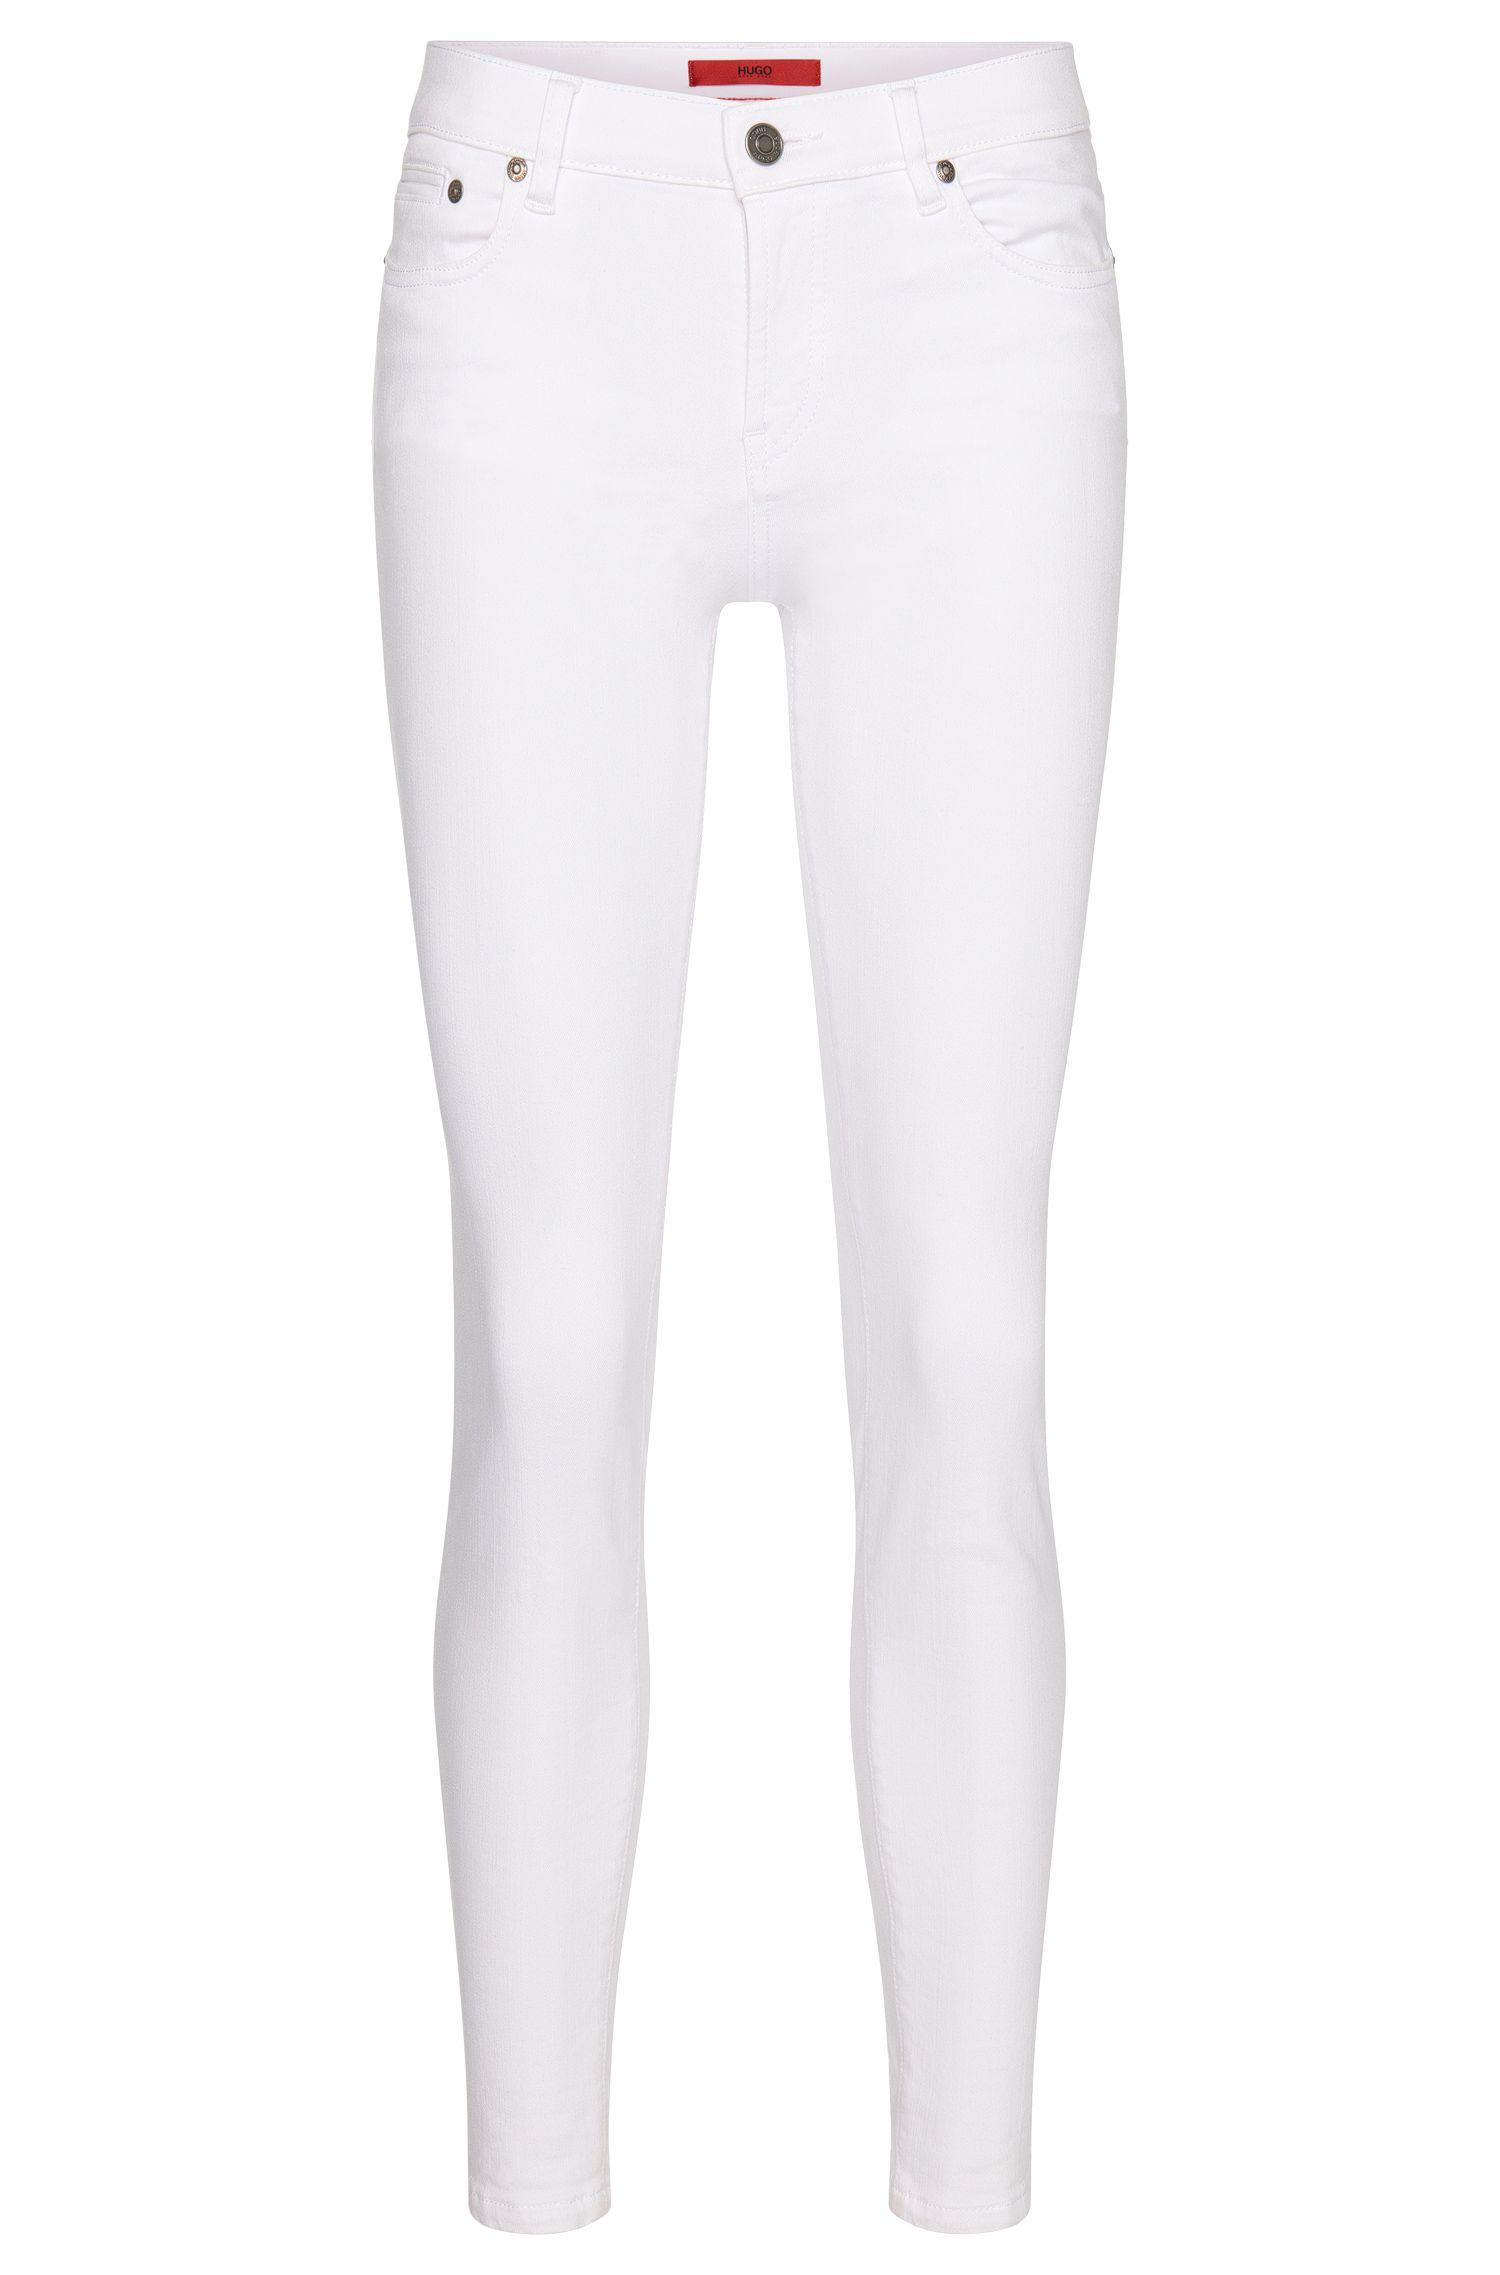 'Gilljana' | Stretch Cotton Blend Zipper Jeans